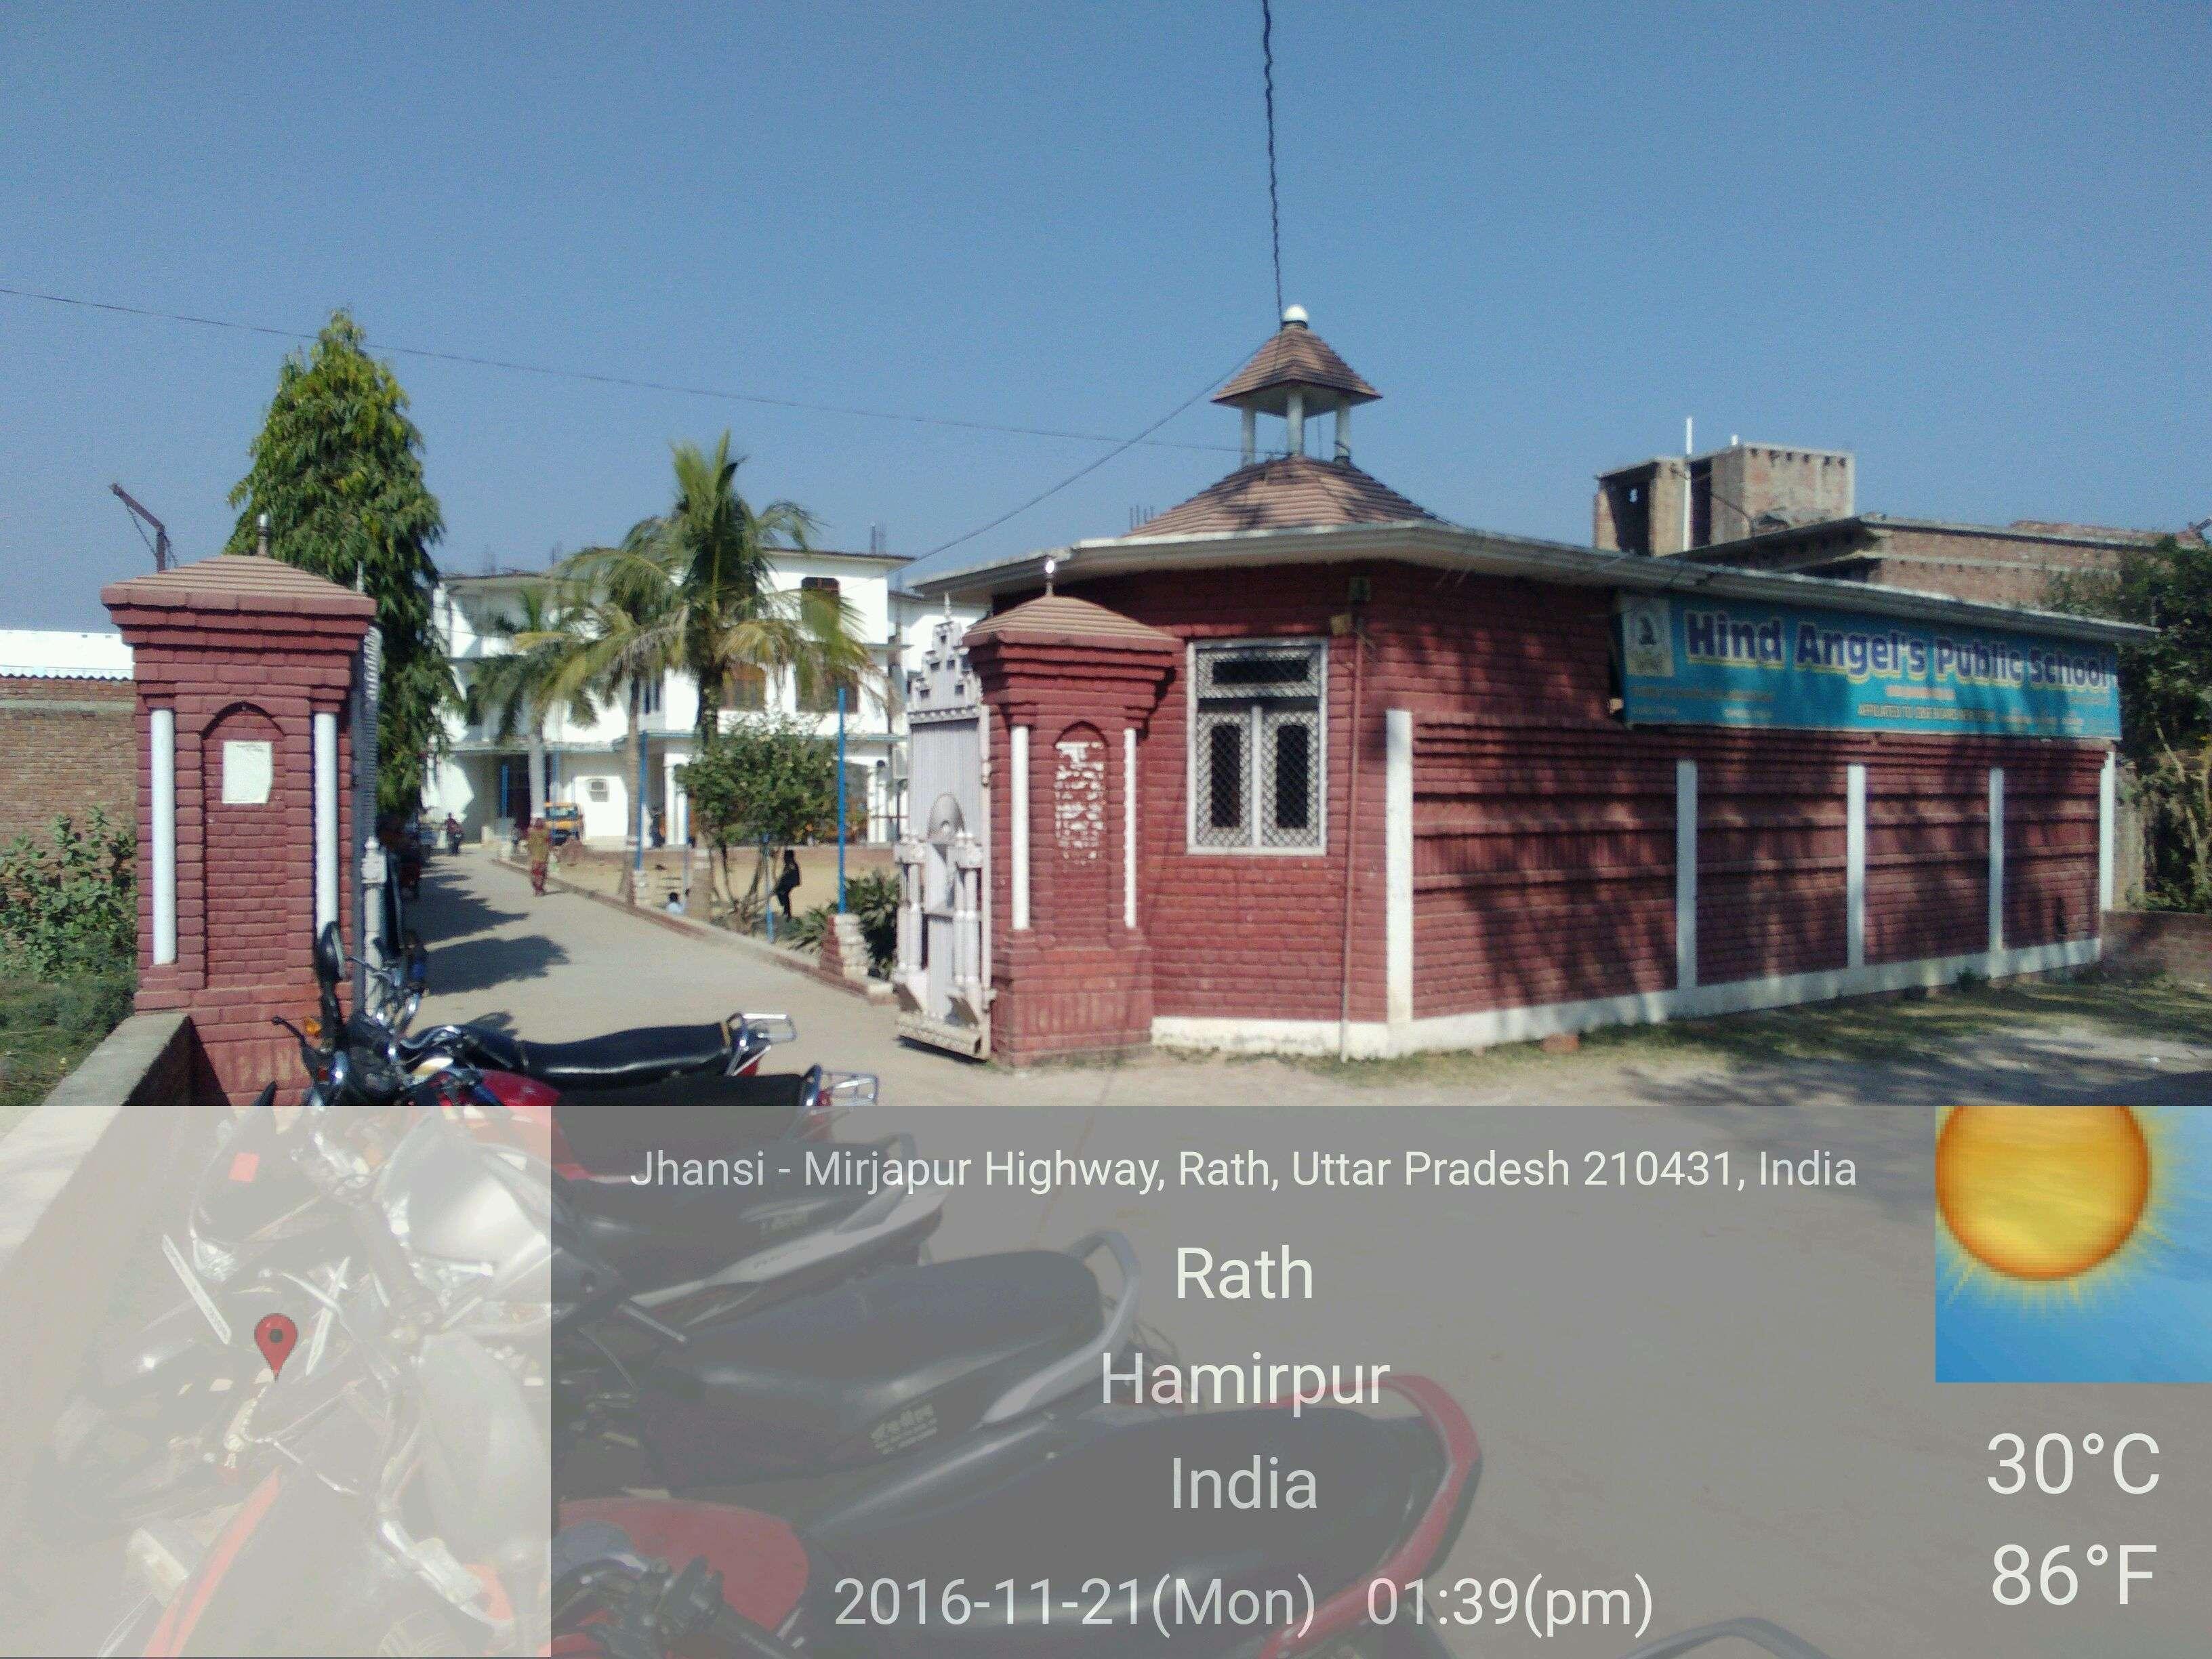 HIND ANGLES PUBLIC SCHOOL HAMIRPUR ROAD RATH UTTAR PRADESH 2130837